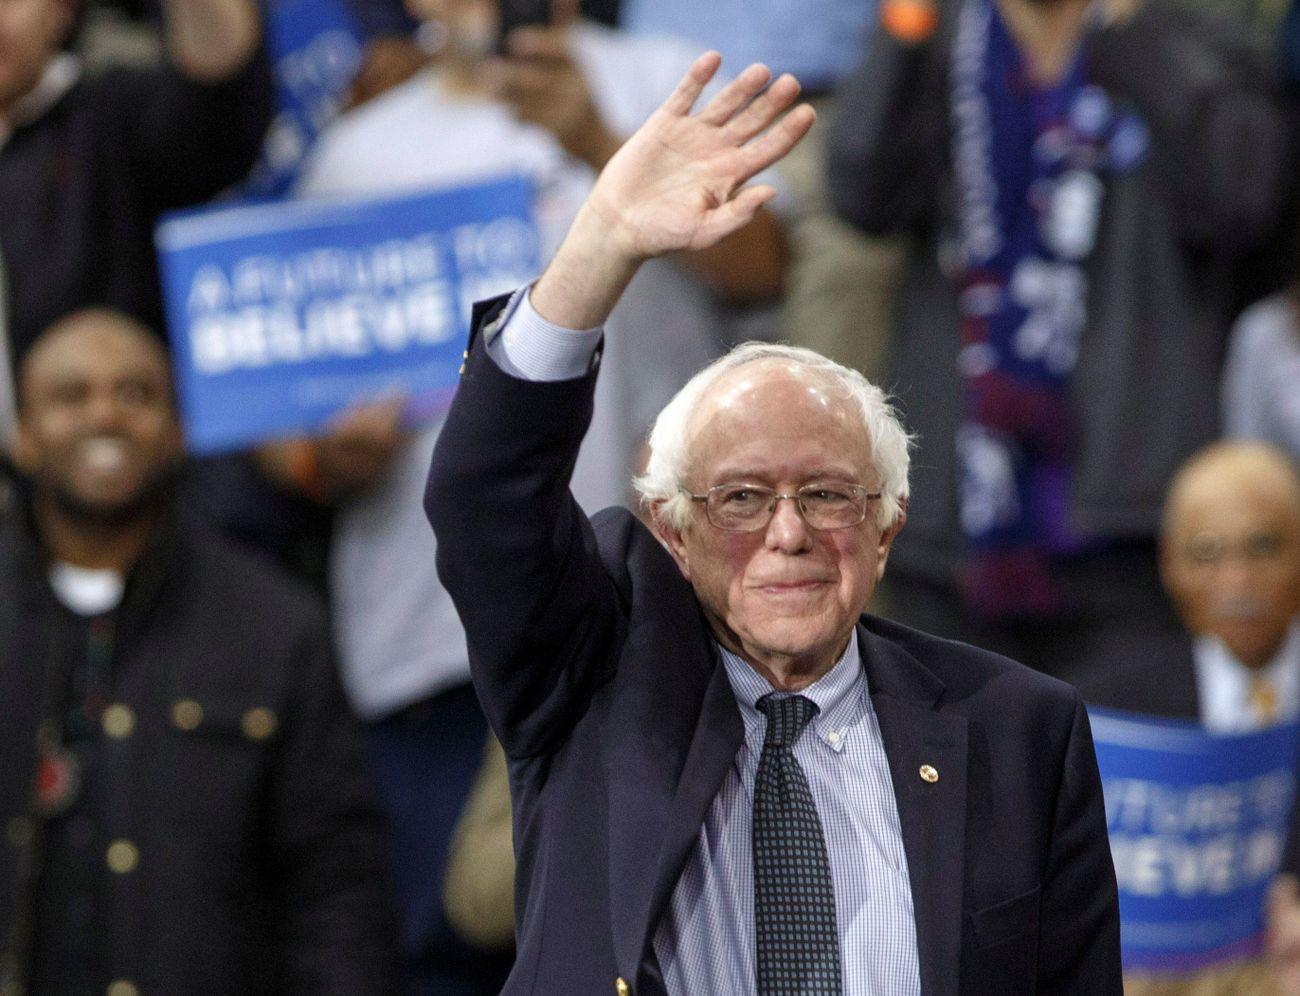 Twitter's meme du jour takes inpsiration from a Bernie Sanders campaign video